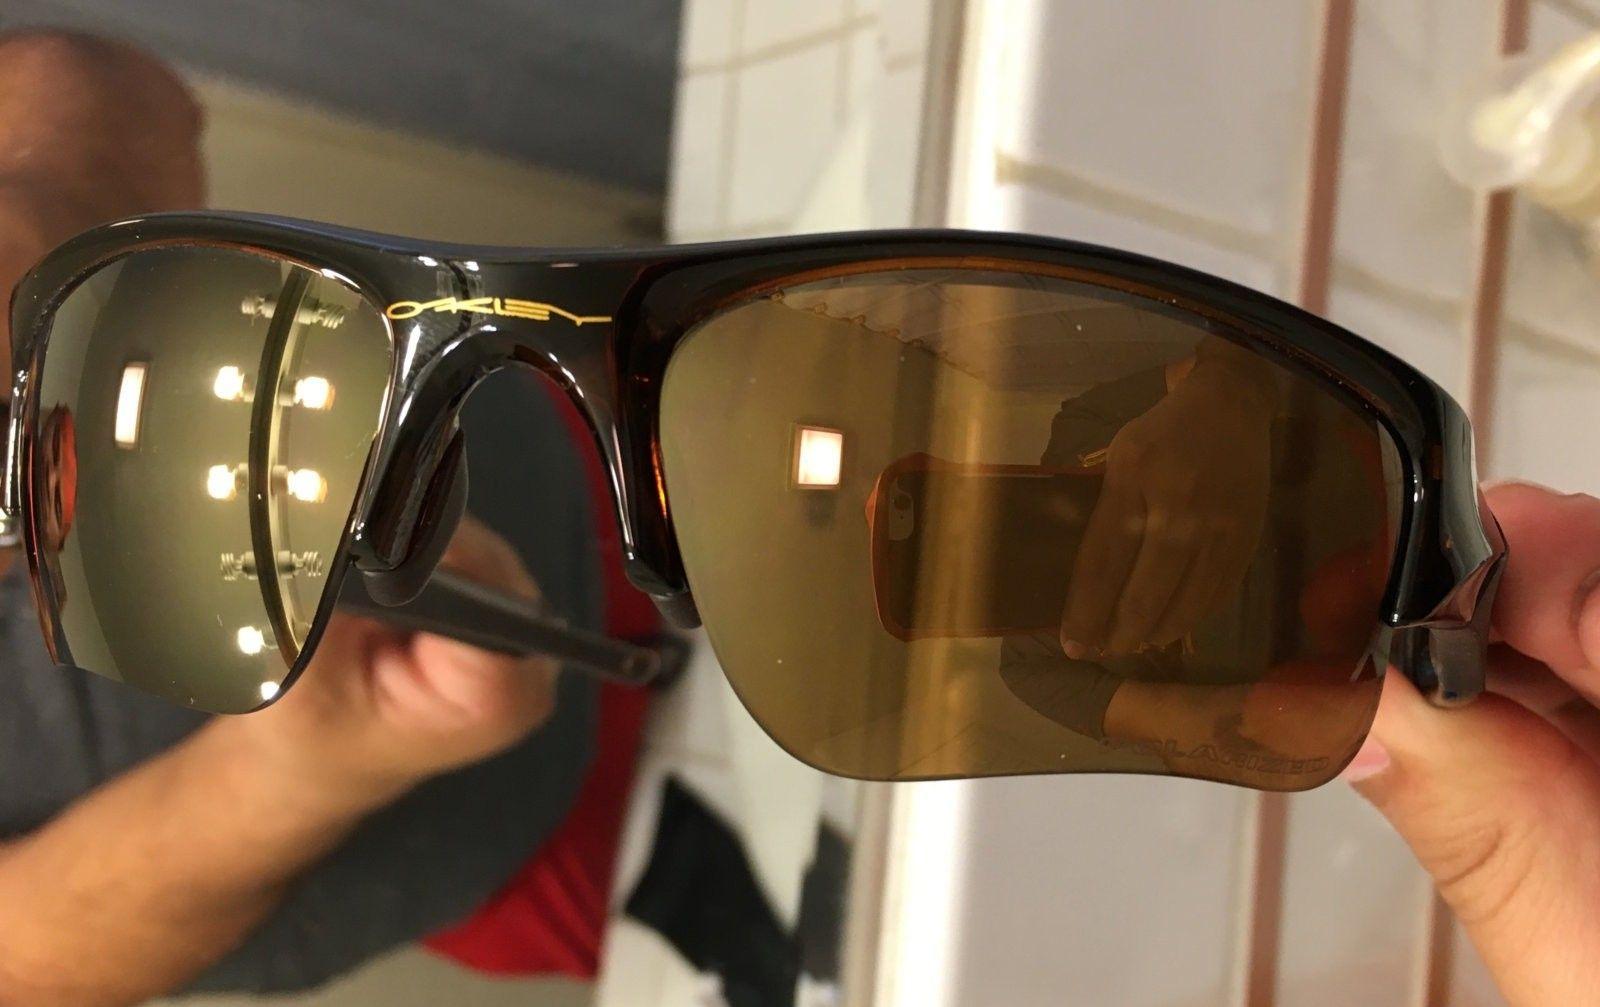 Flak Jacket 1.0 - 2 pairs - Polarized lenses - 2016-07-07 19.24.39.jpg